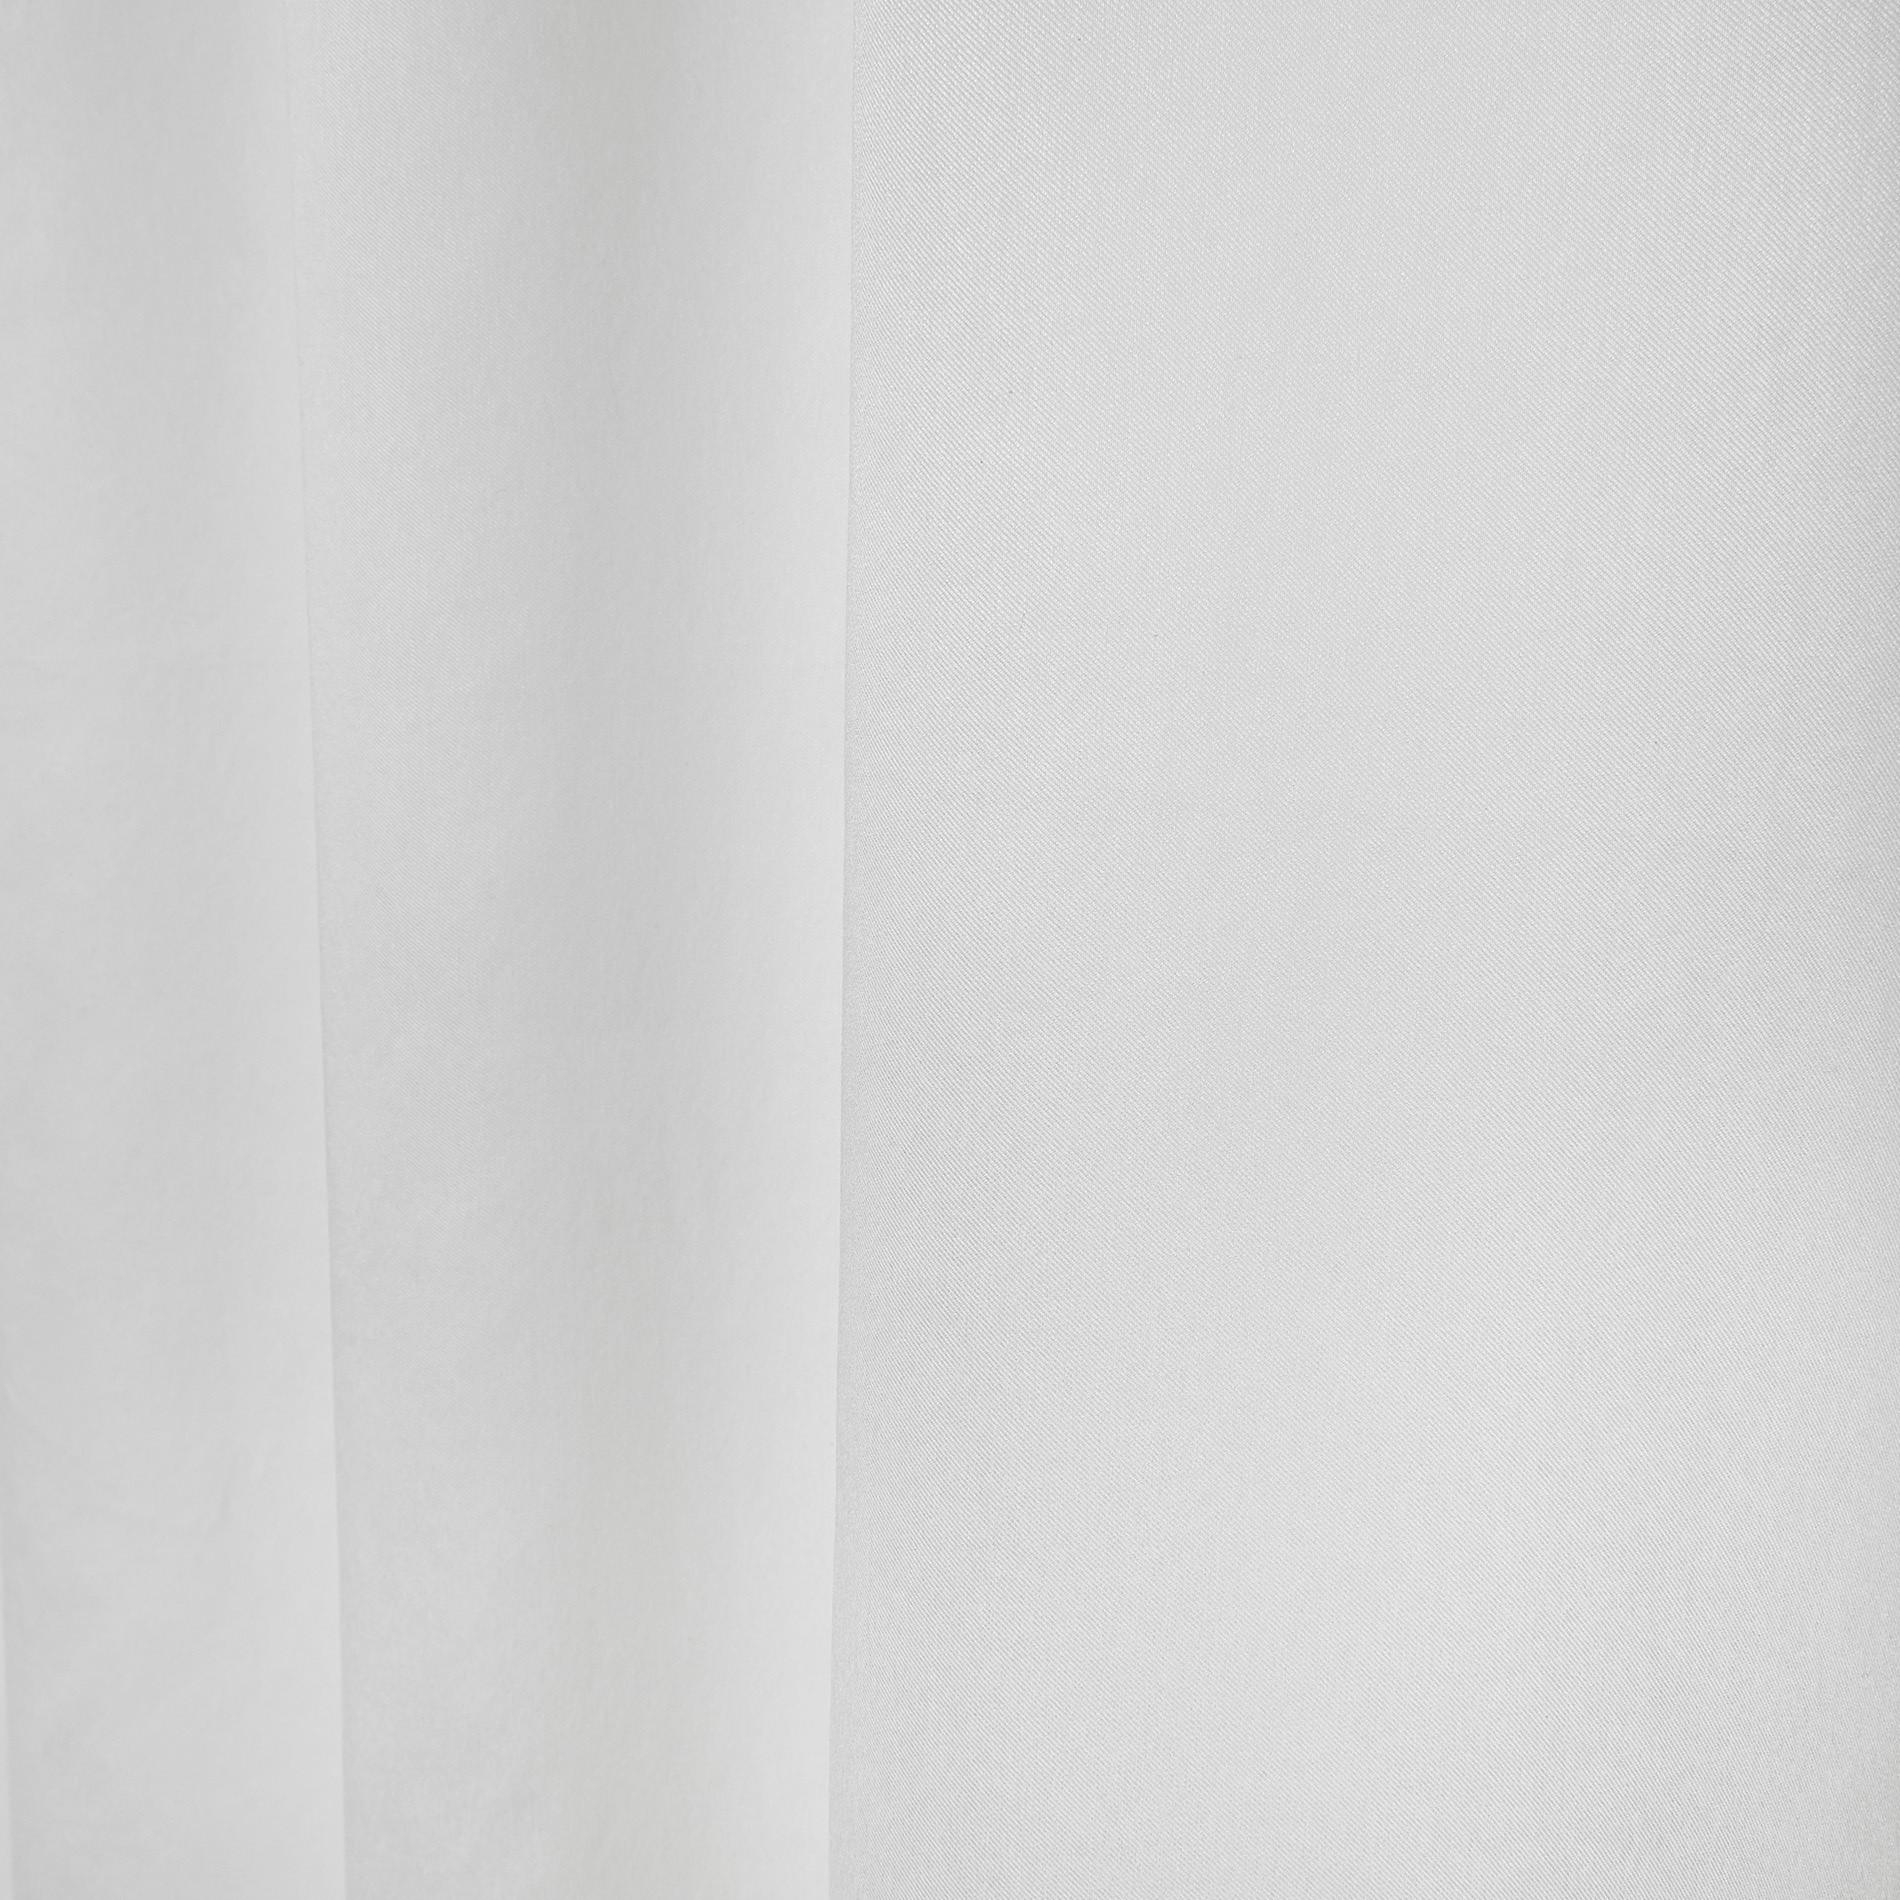 Tenda misto viscosa passanti nascosti, Bianco ghiaccio, large image number 3